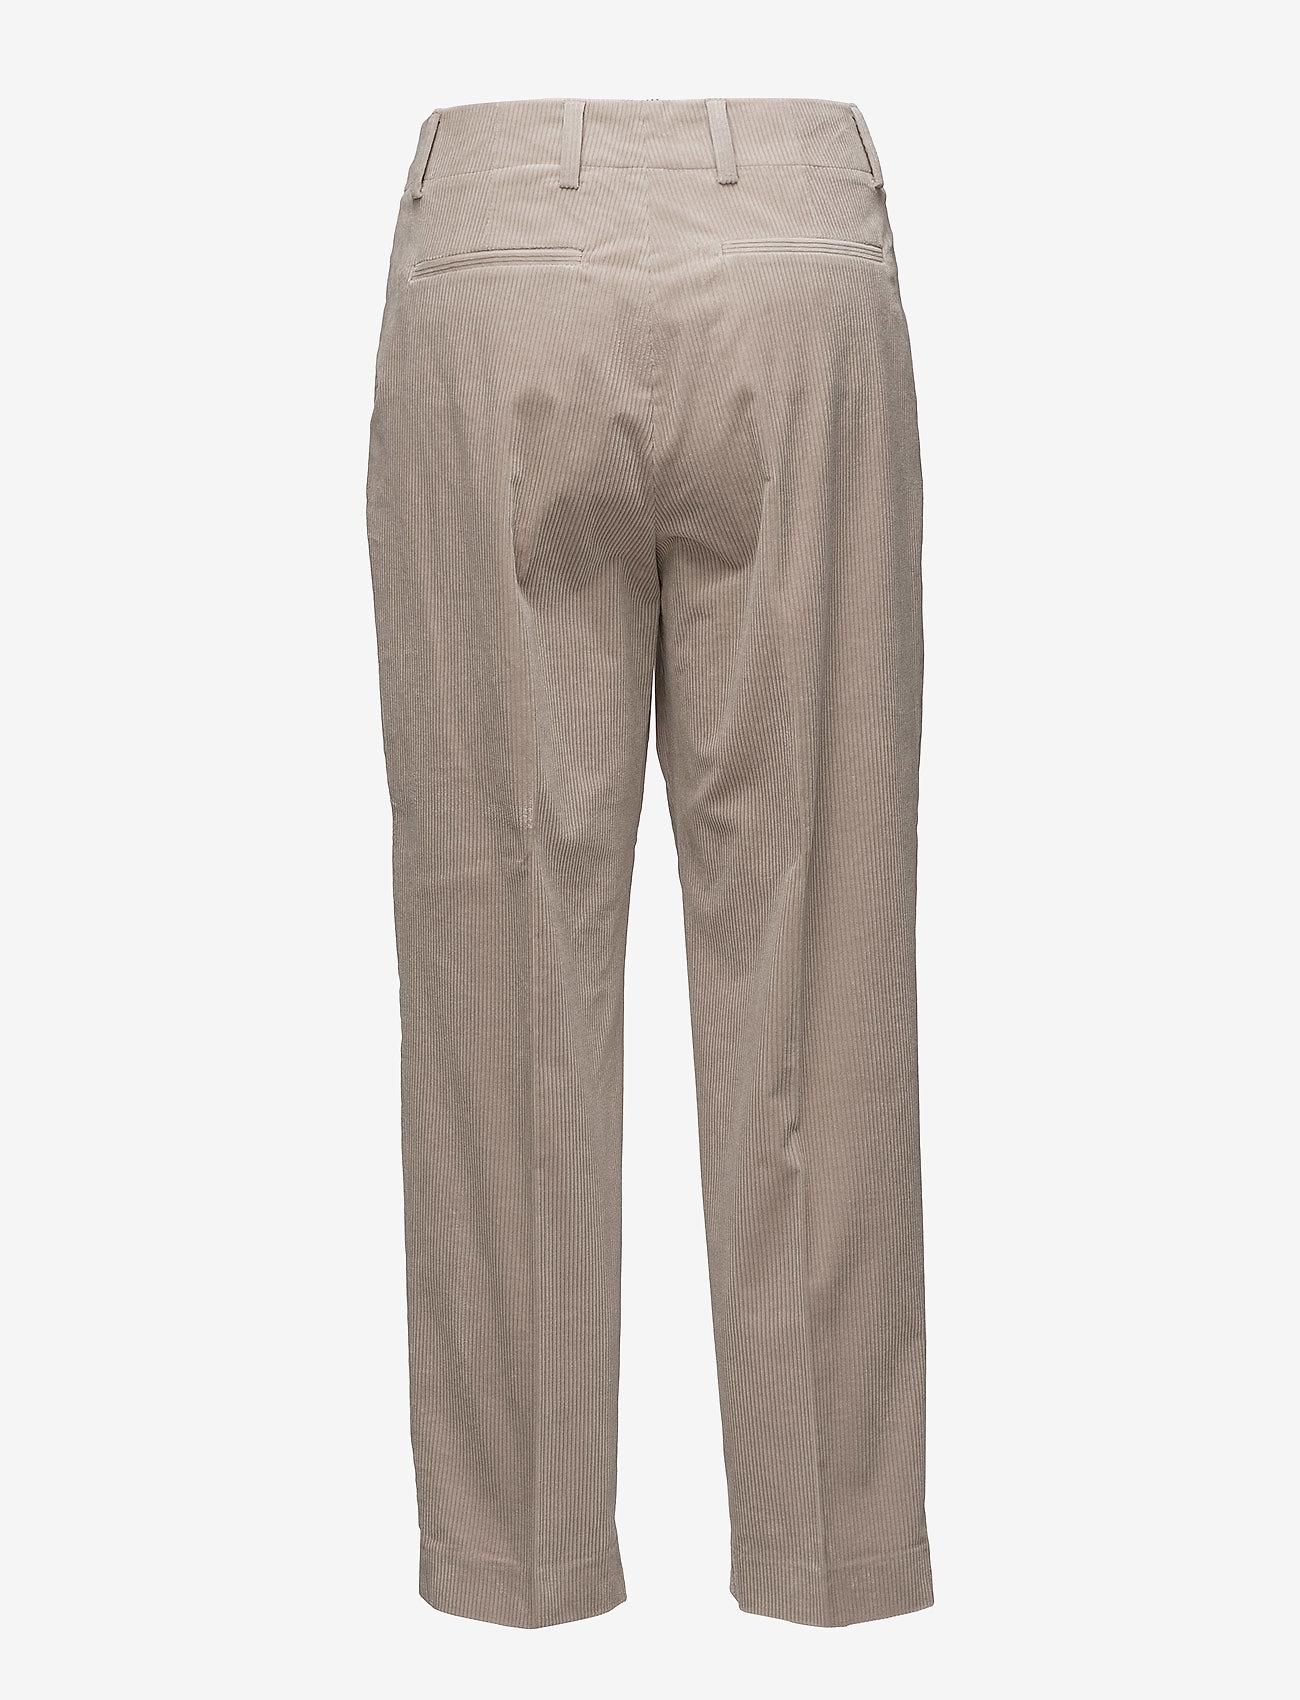 Filippa K Simone Cord Trousers -